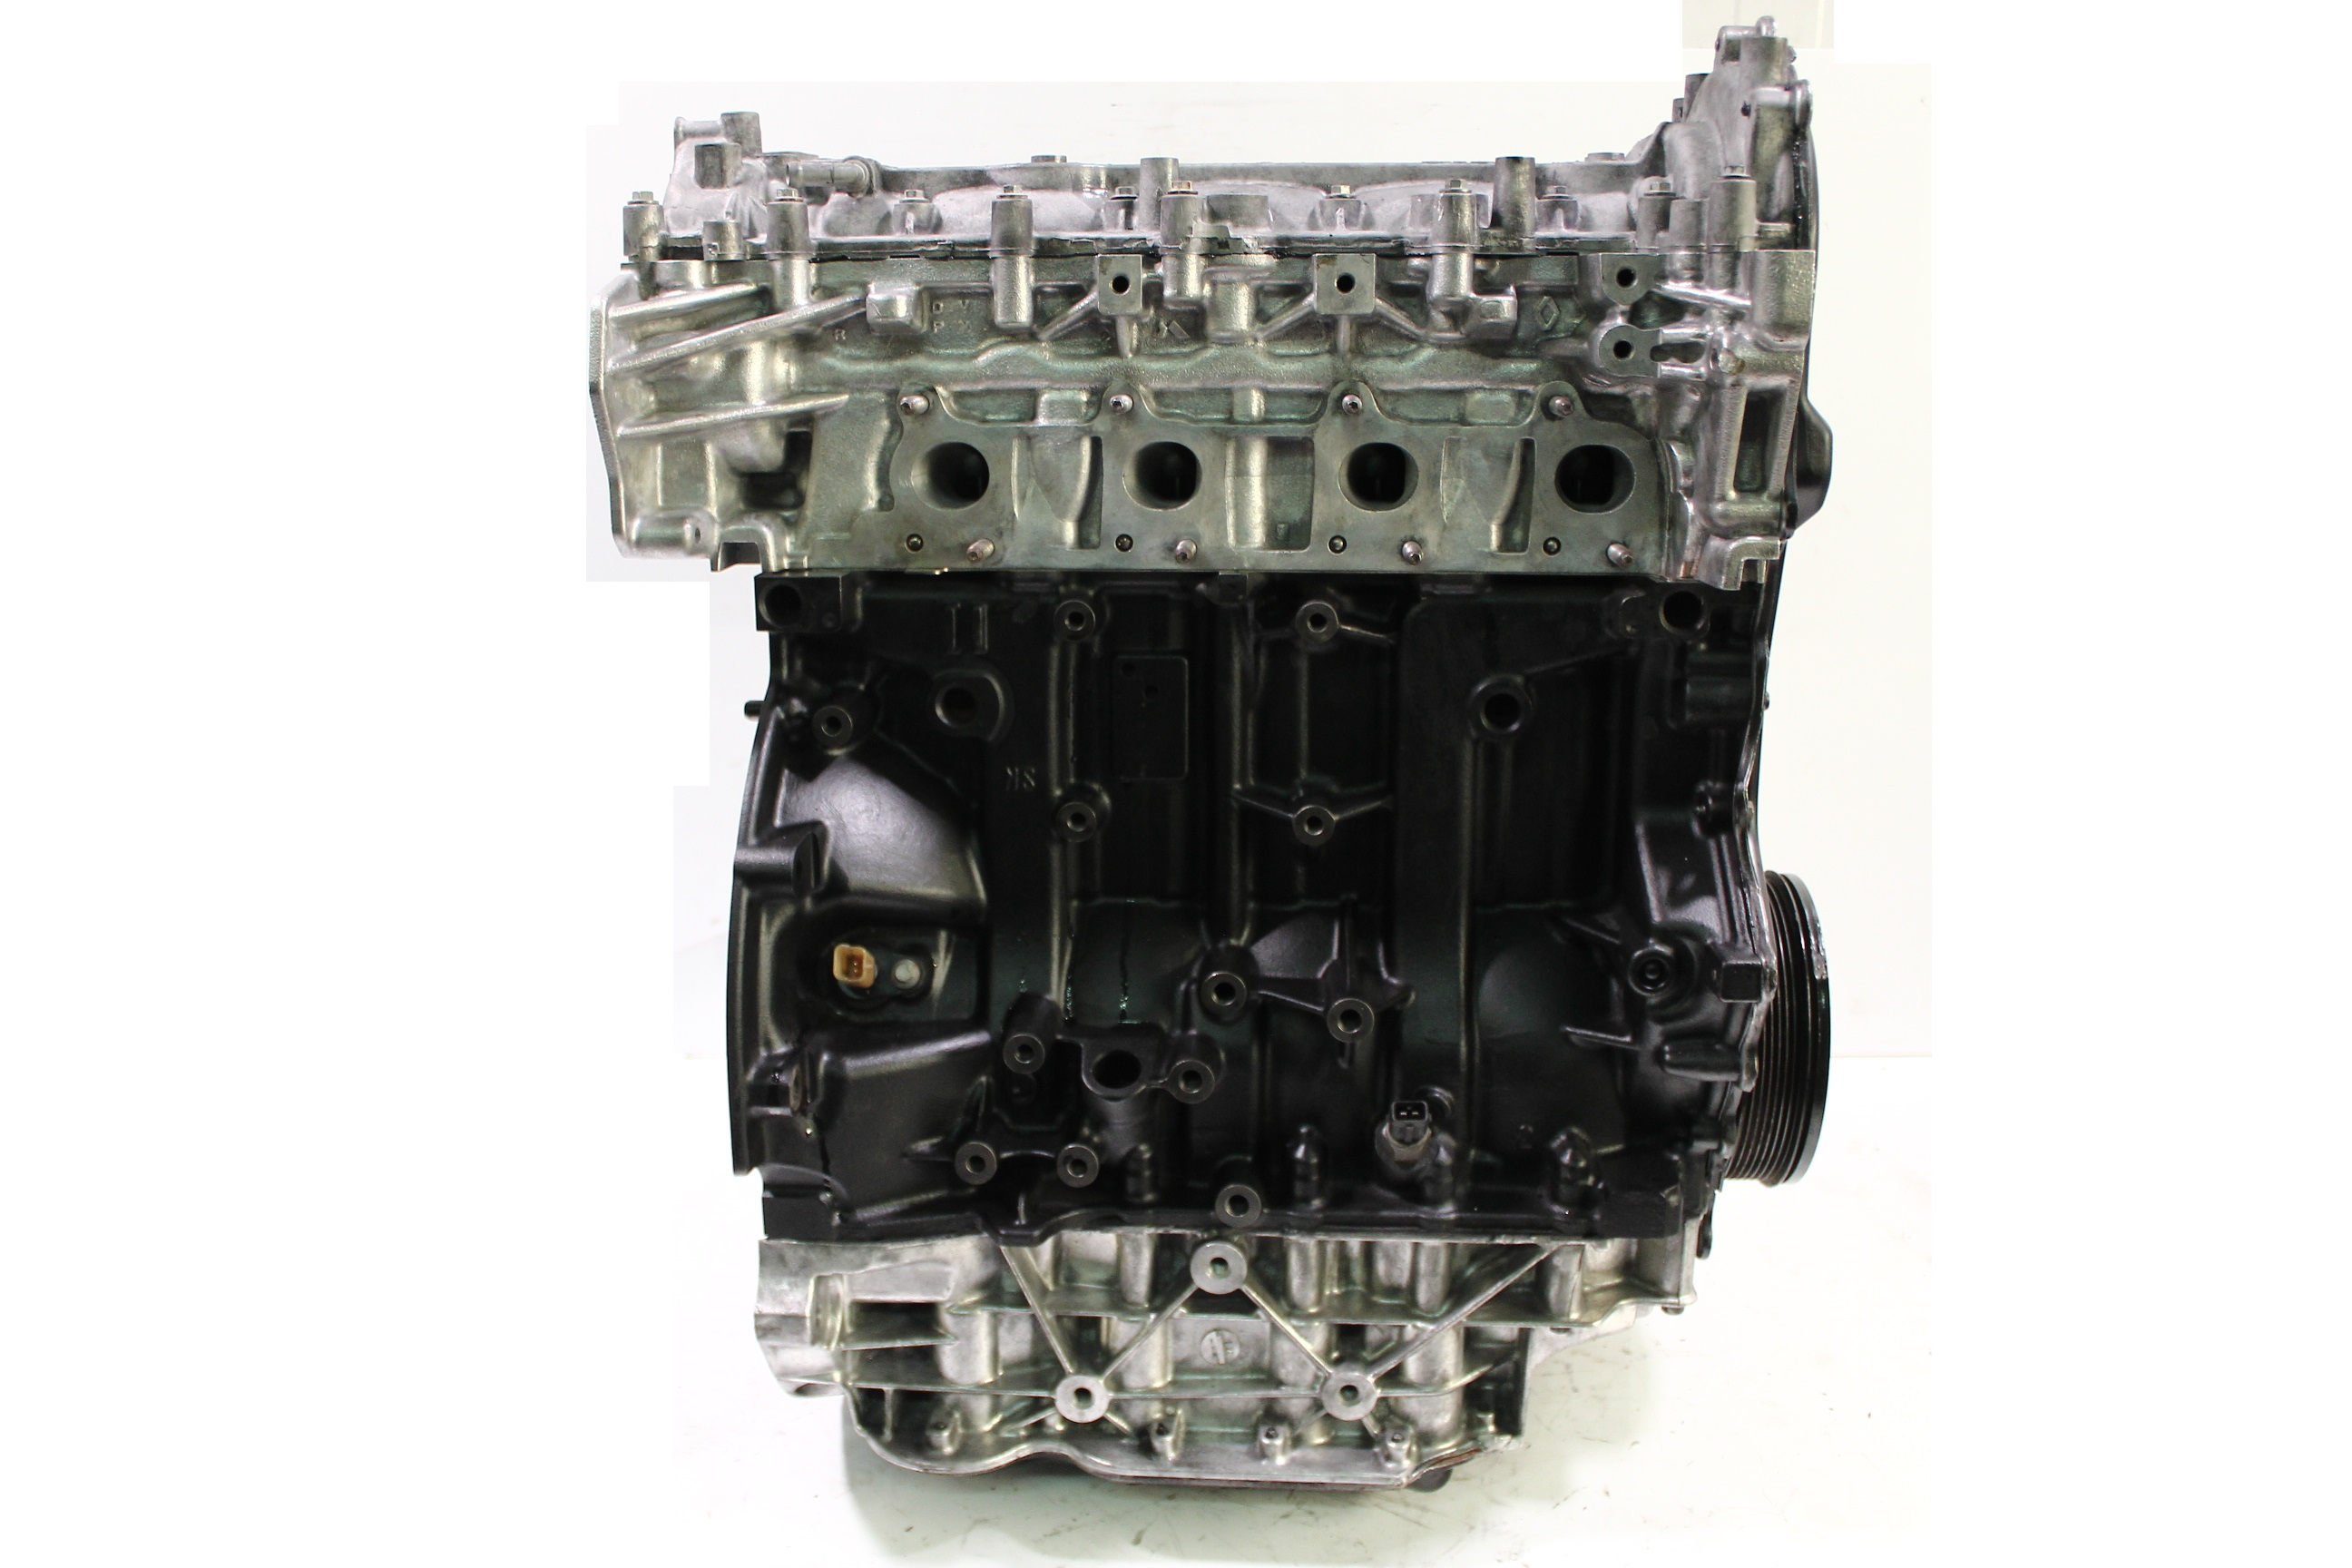 Motor 2010 Renault Laguna III 2,0 dCi M9R742 M9R Kopf geplant Dichtung NEU